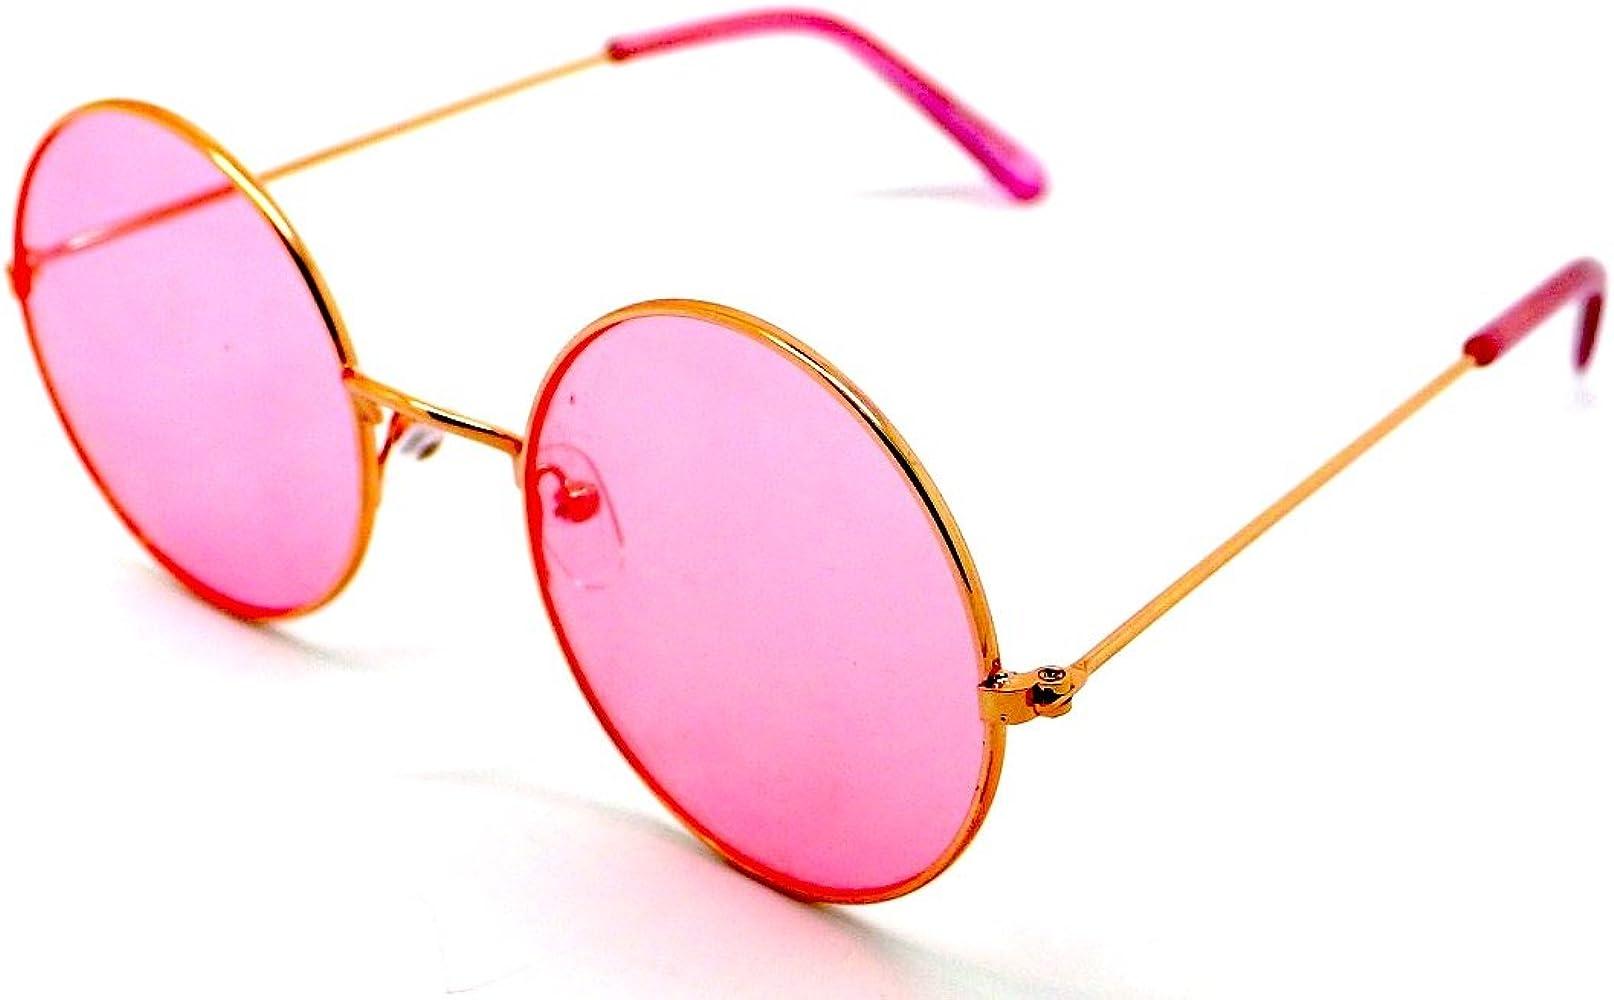 Totalcovers Gafas de Sol Hippie Retro Redondas Lagofree Alta ...